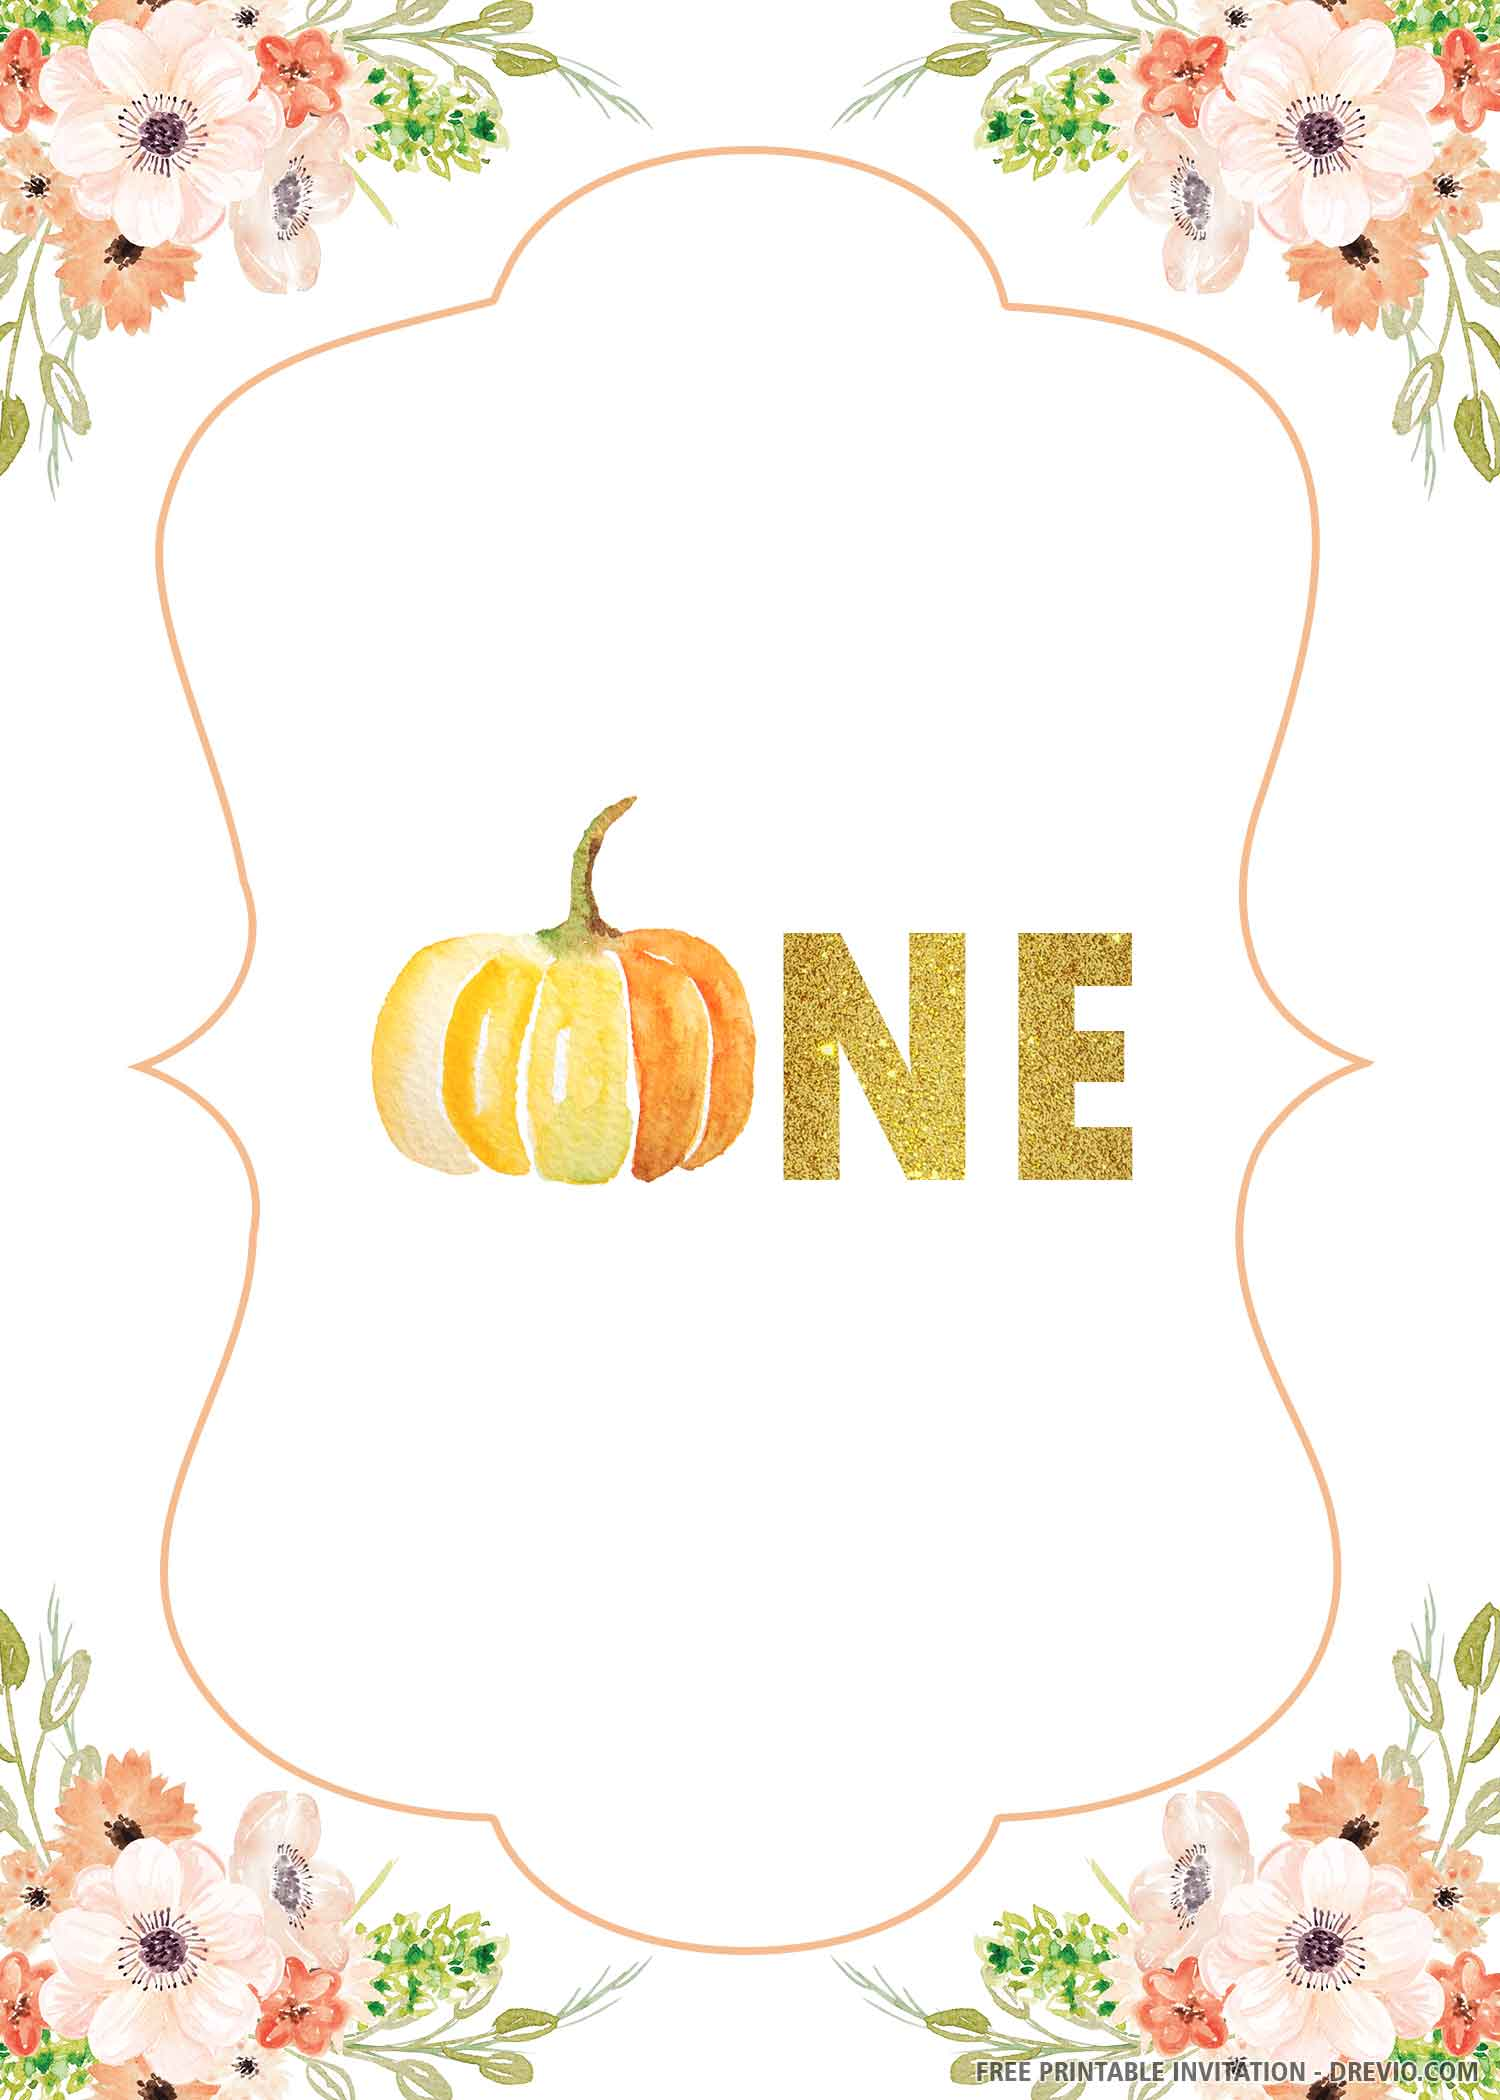 Free Printable Little Pumpkin First Birthday Invitation